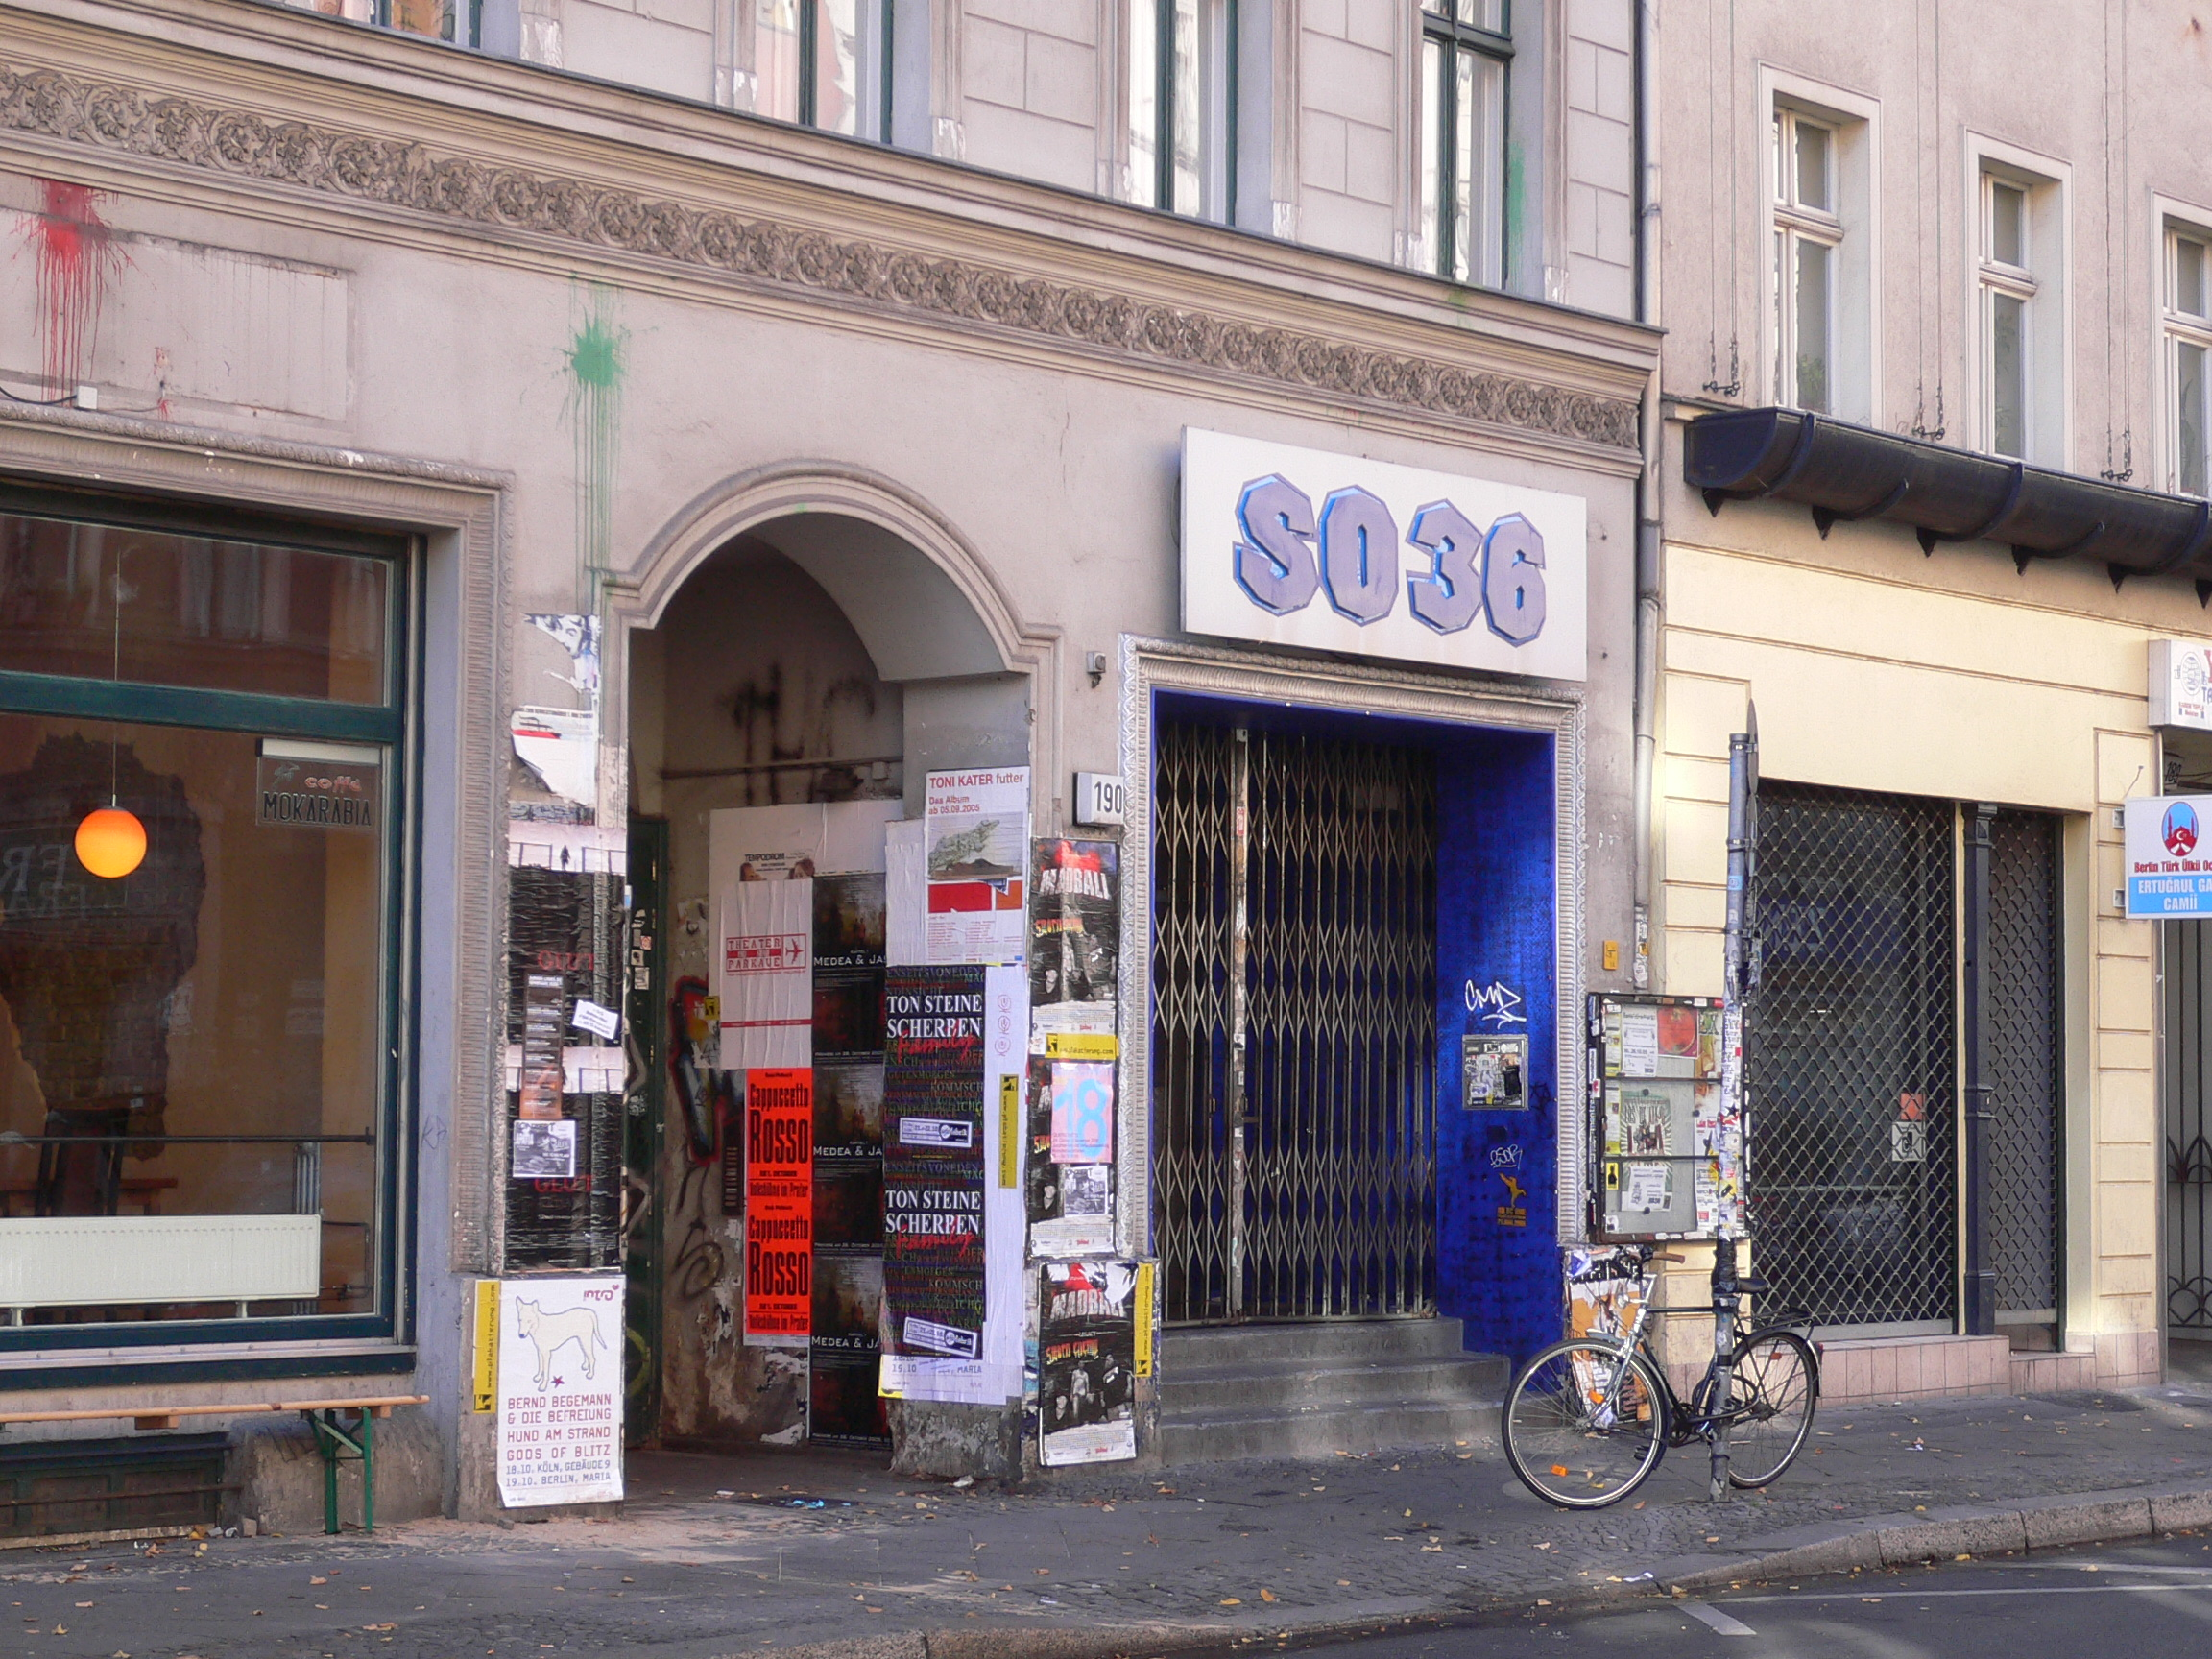 SO36 (Berlin's CBGB's)